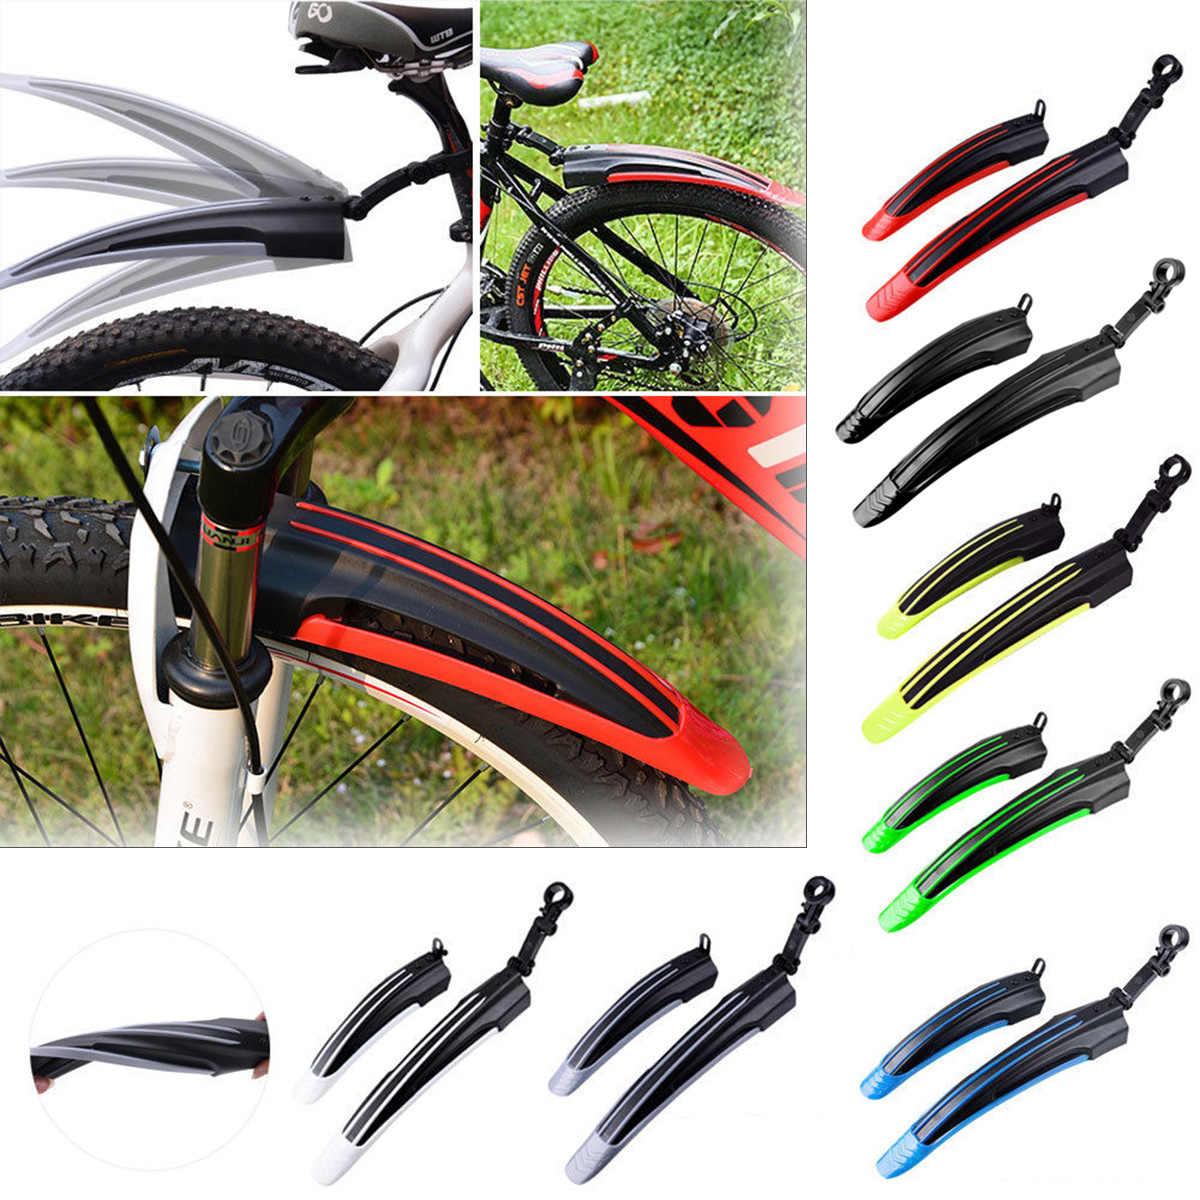 MTB Mudguard Guard Set Mountain Bike Bicycle Fender Front Rear Tyre Mud Guard